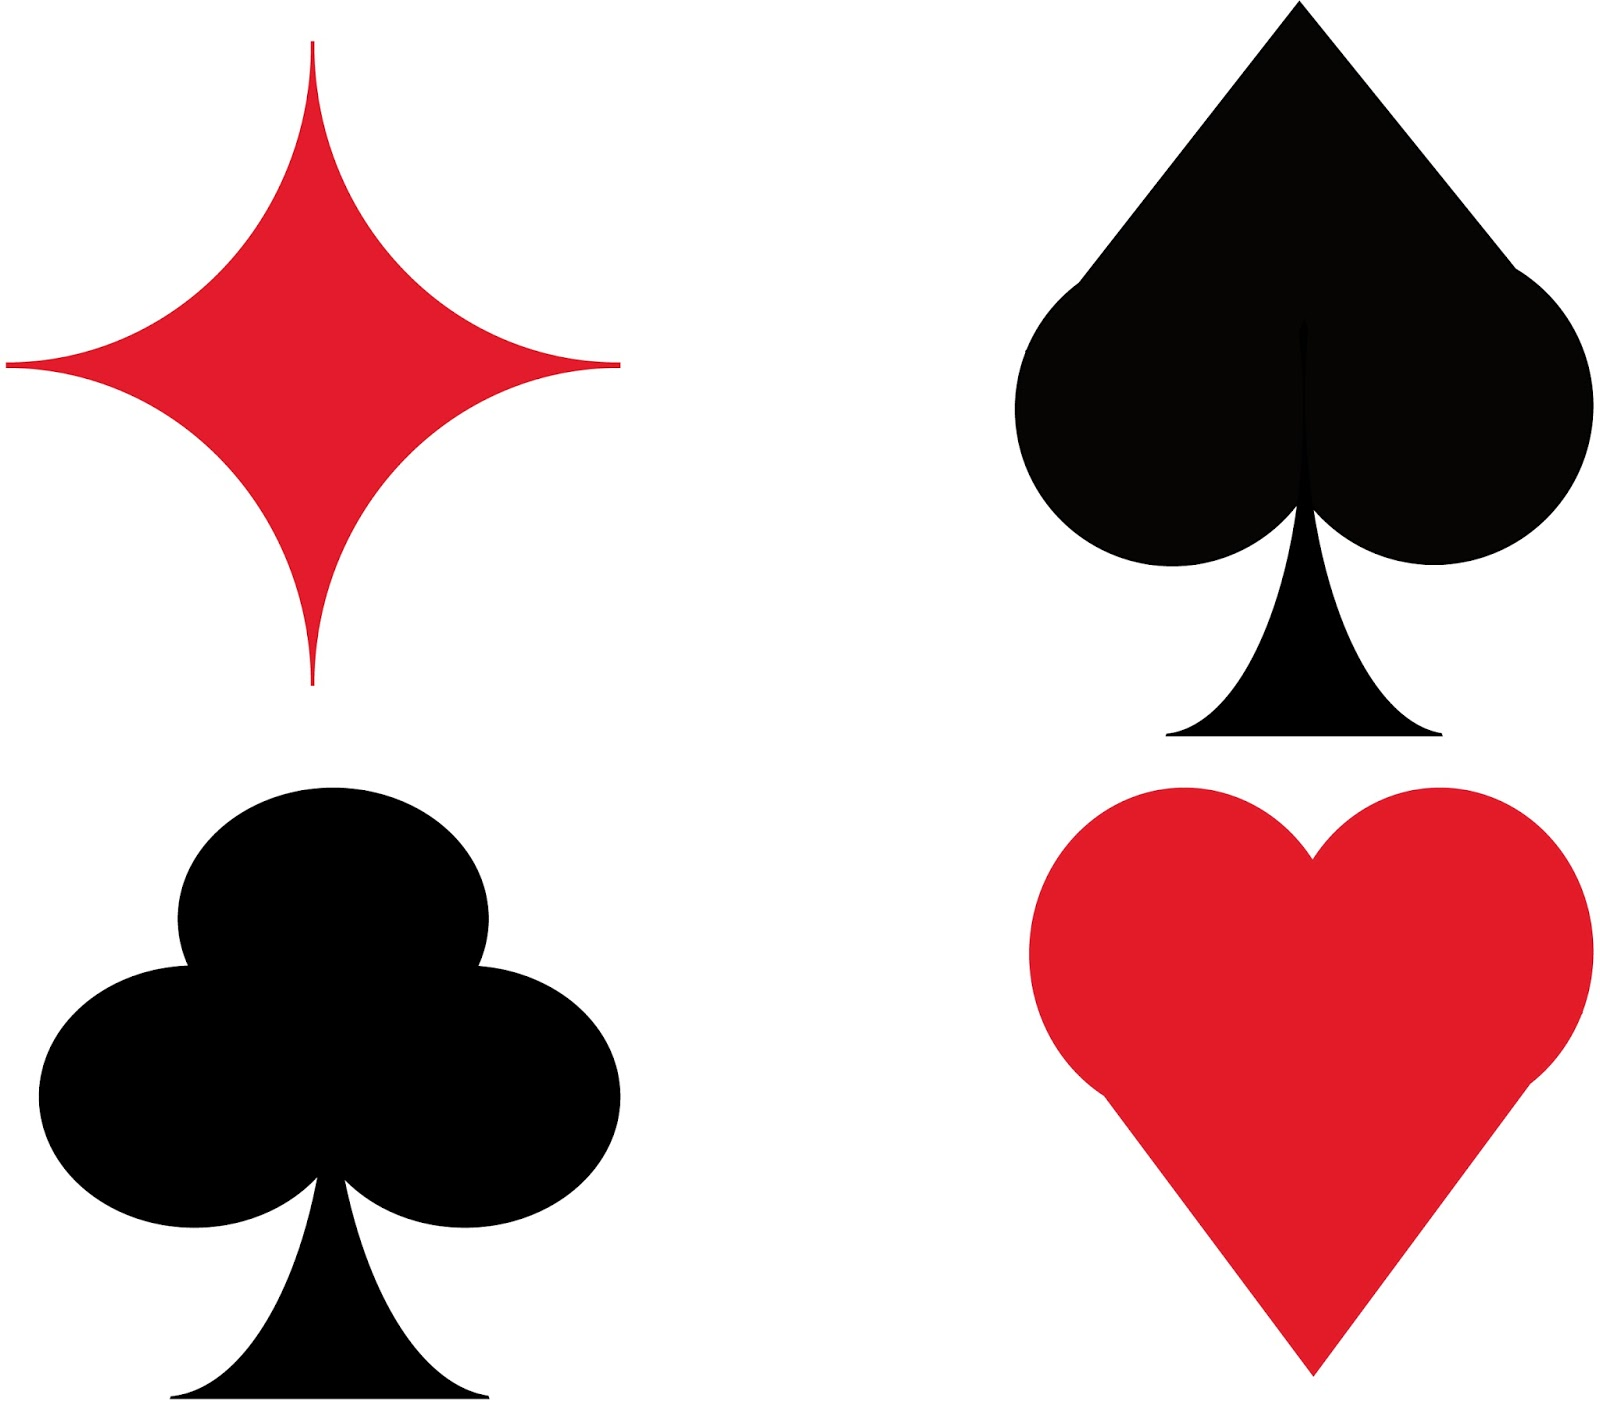 Jugar tragamonedas con tarjeta de debito 5 tiradas gratis-817480